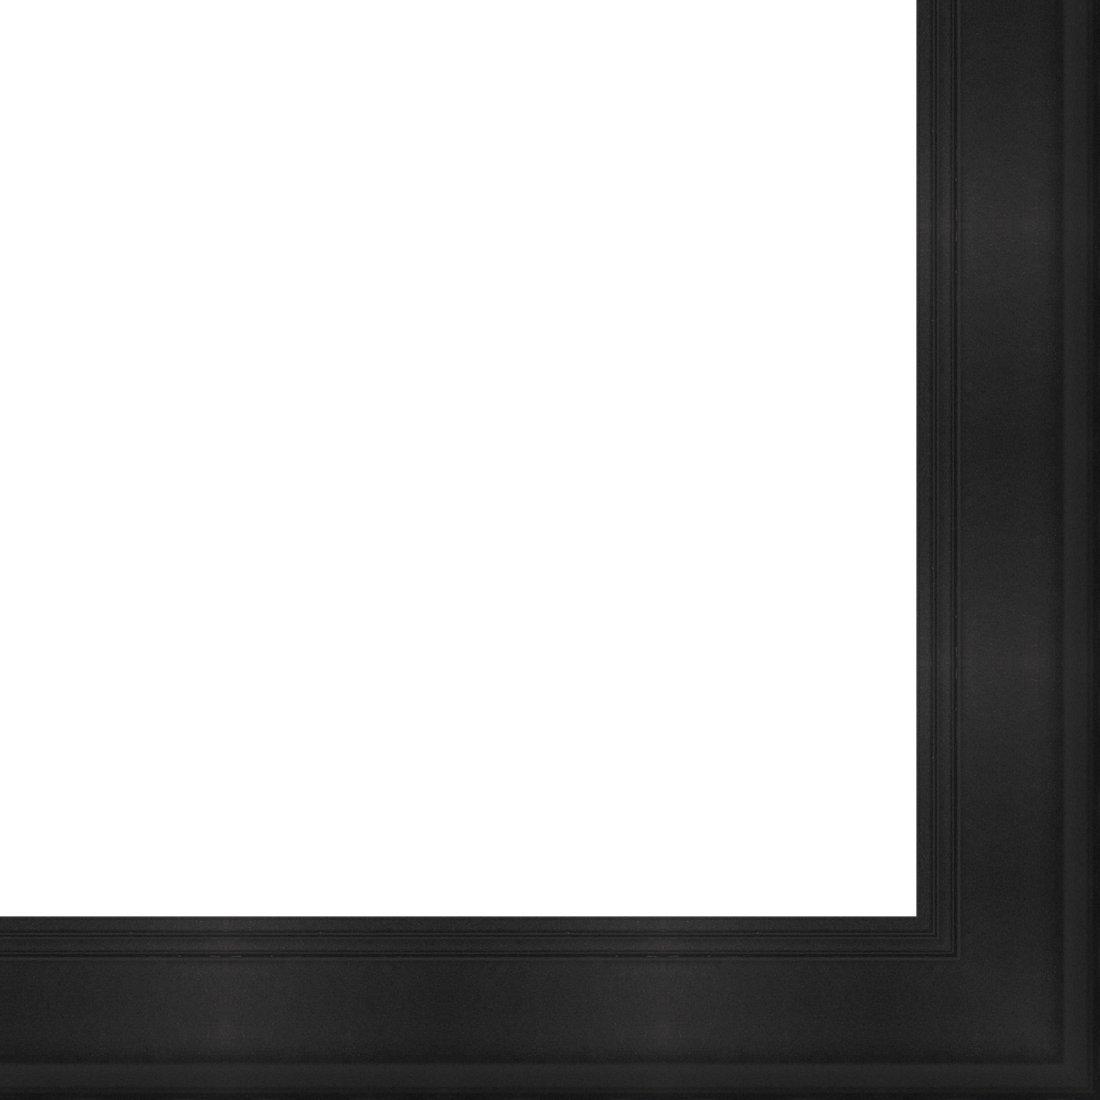 Picture Frame Moulding (Wood) 18ft bundle - Contemporary Black Finish - 1.5'' width - 1'' rabbet depth